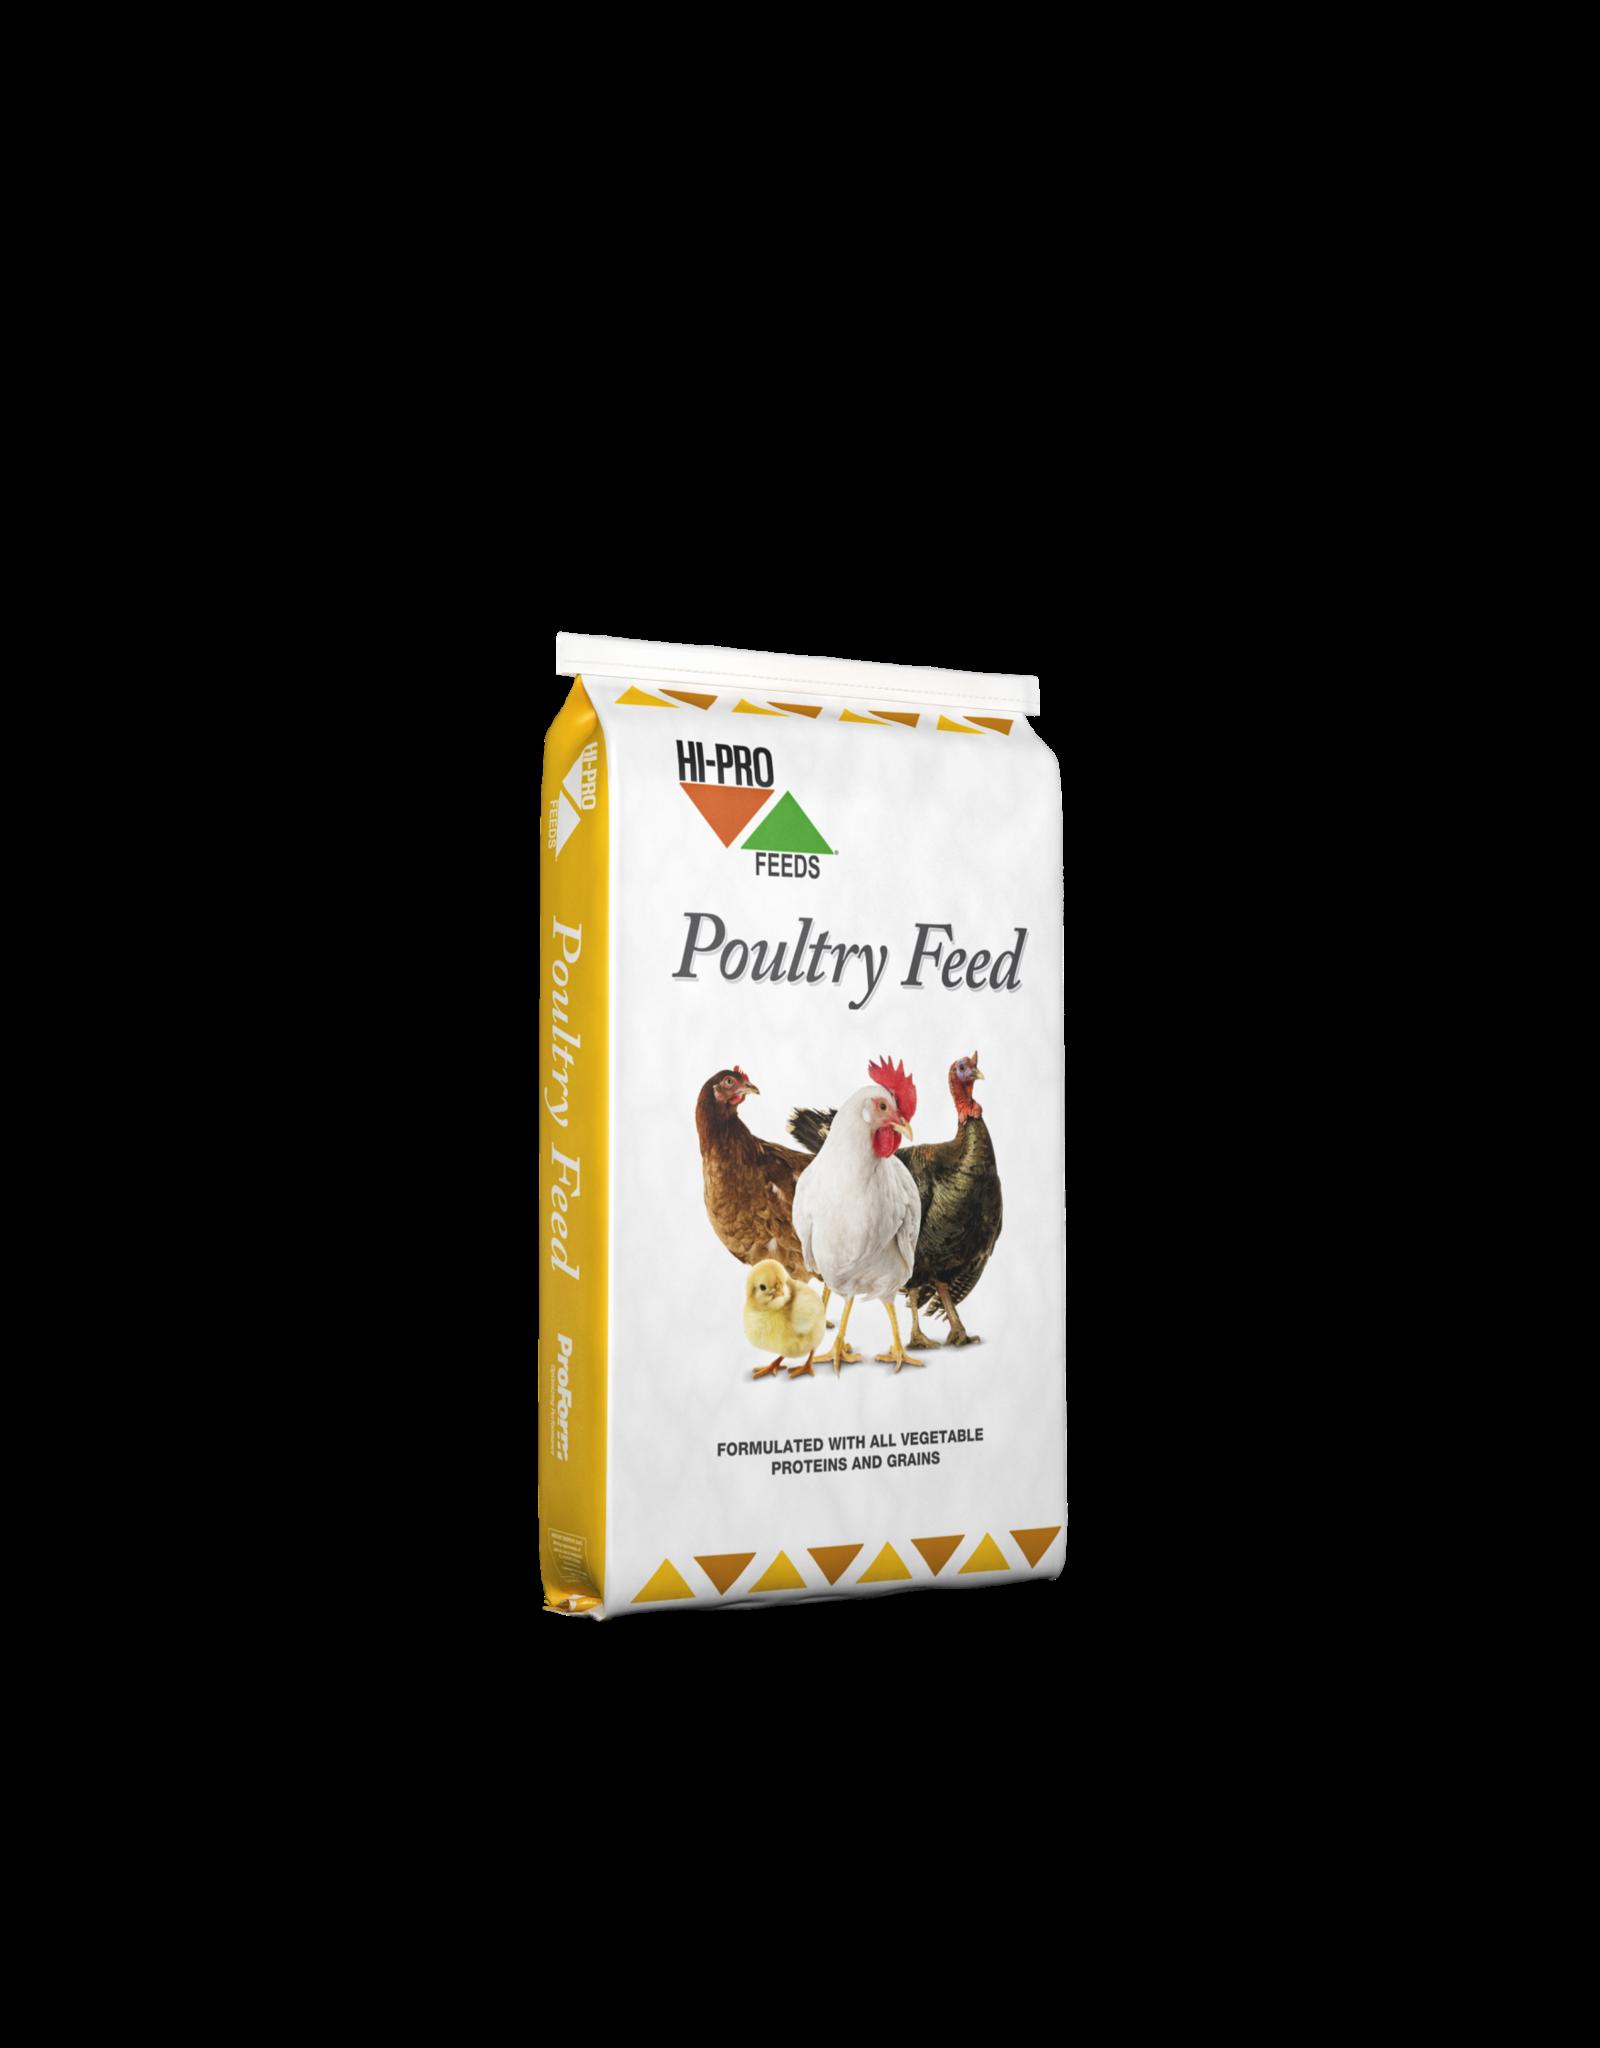 HiPro Feeds (Trouw) HiPro 22% Duck & Goose Starter/Turkey Grower Crumbles 20KG